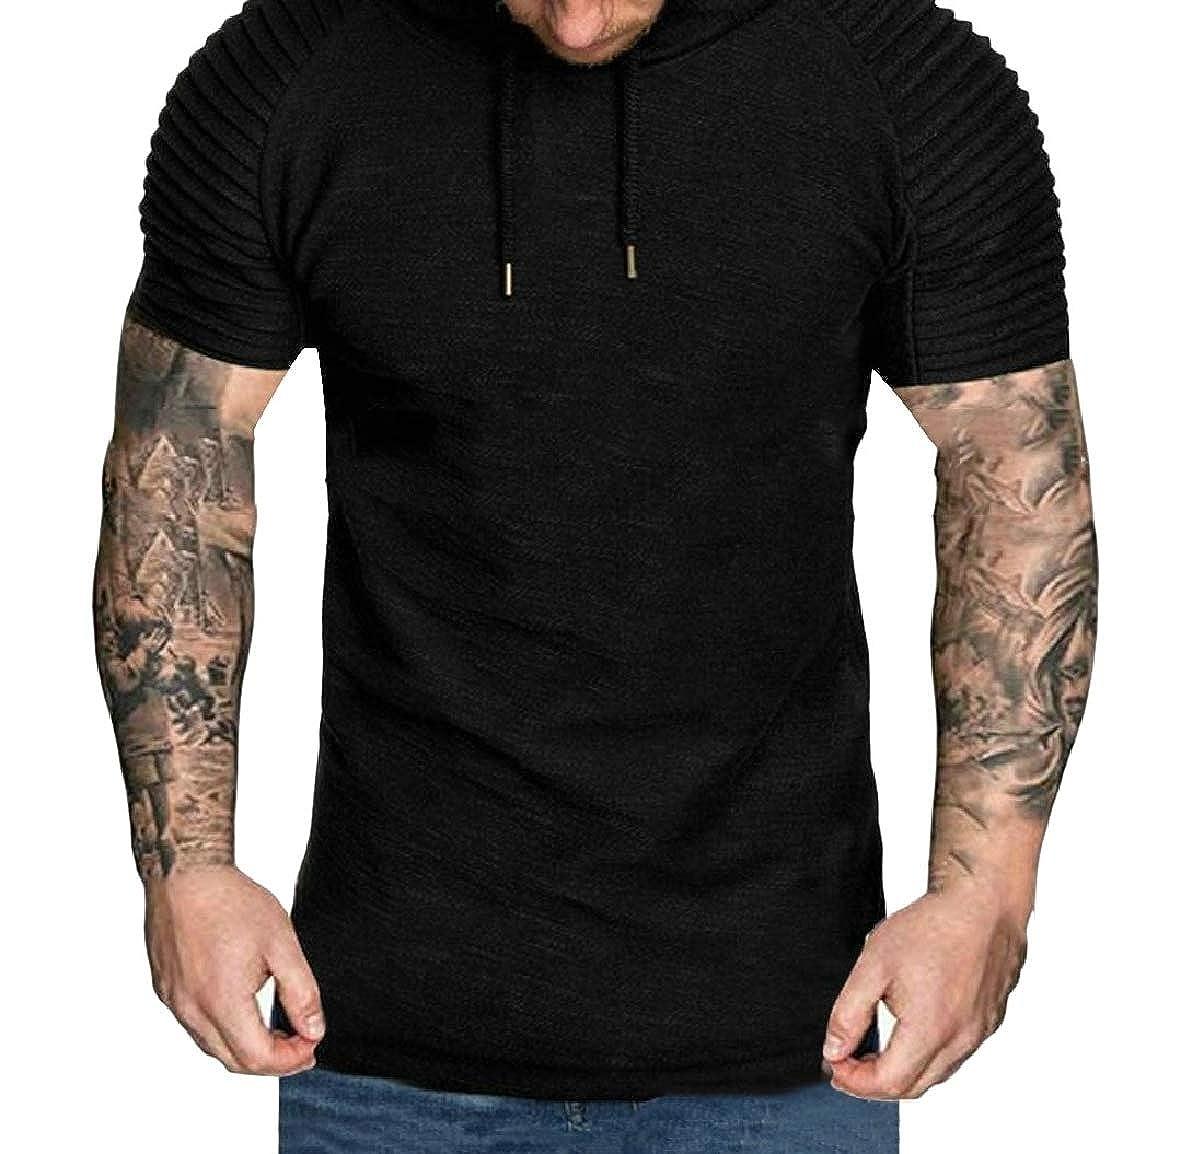 CBTLVSN Mens Short Sleeve Hoodie Stripe Solid Slim Fit Round Neck T-Shirt